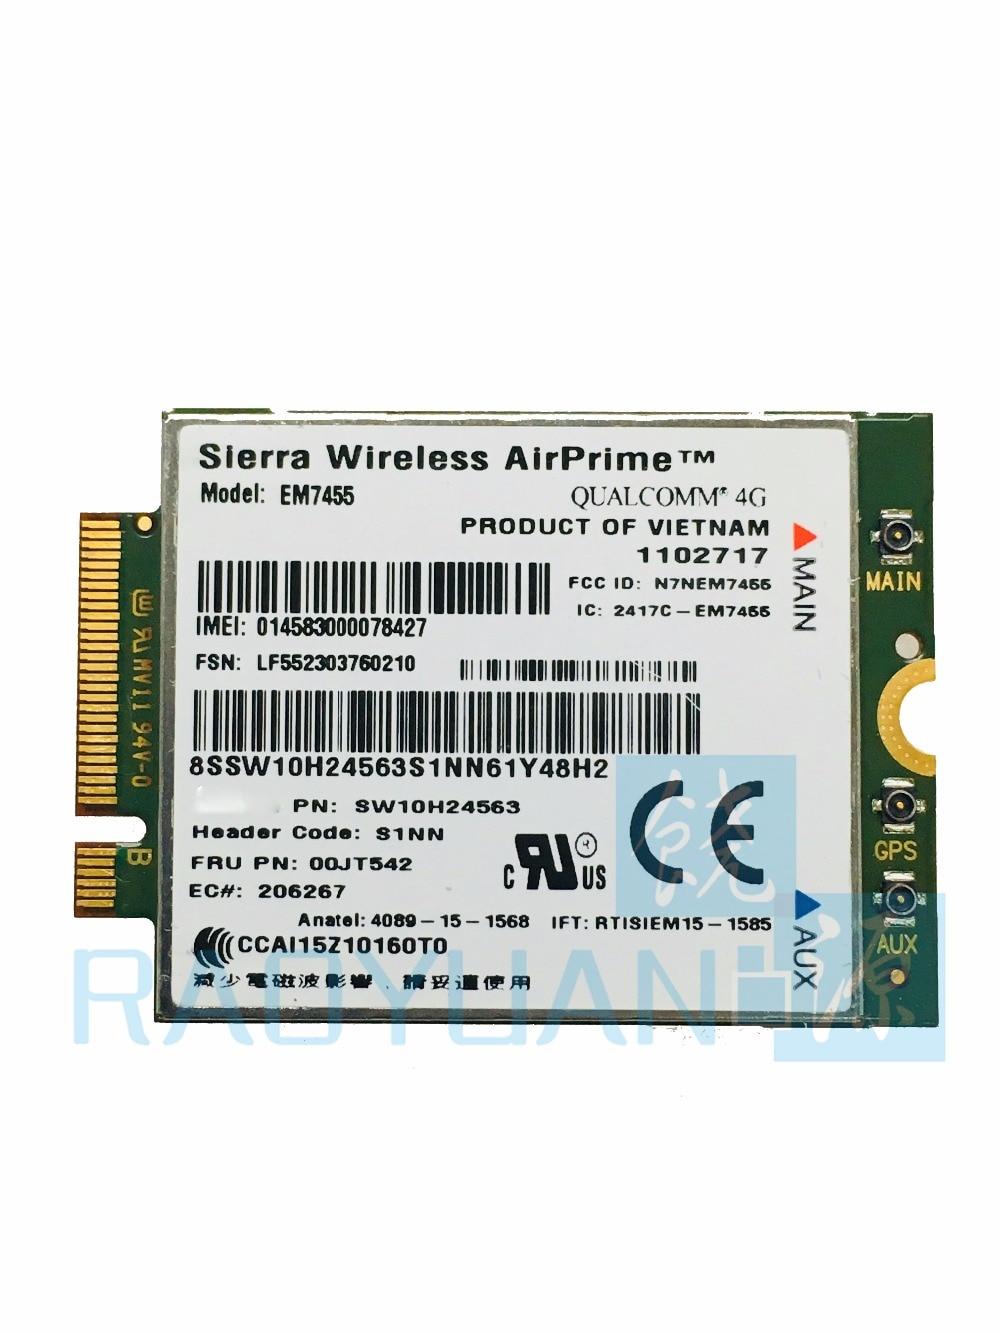 4G LTE WWAN for Sierra Wireless Airprime EM7455 QUALCOMM FRU 00JT542 For Lenovo X260 T460 P50